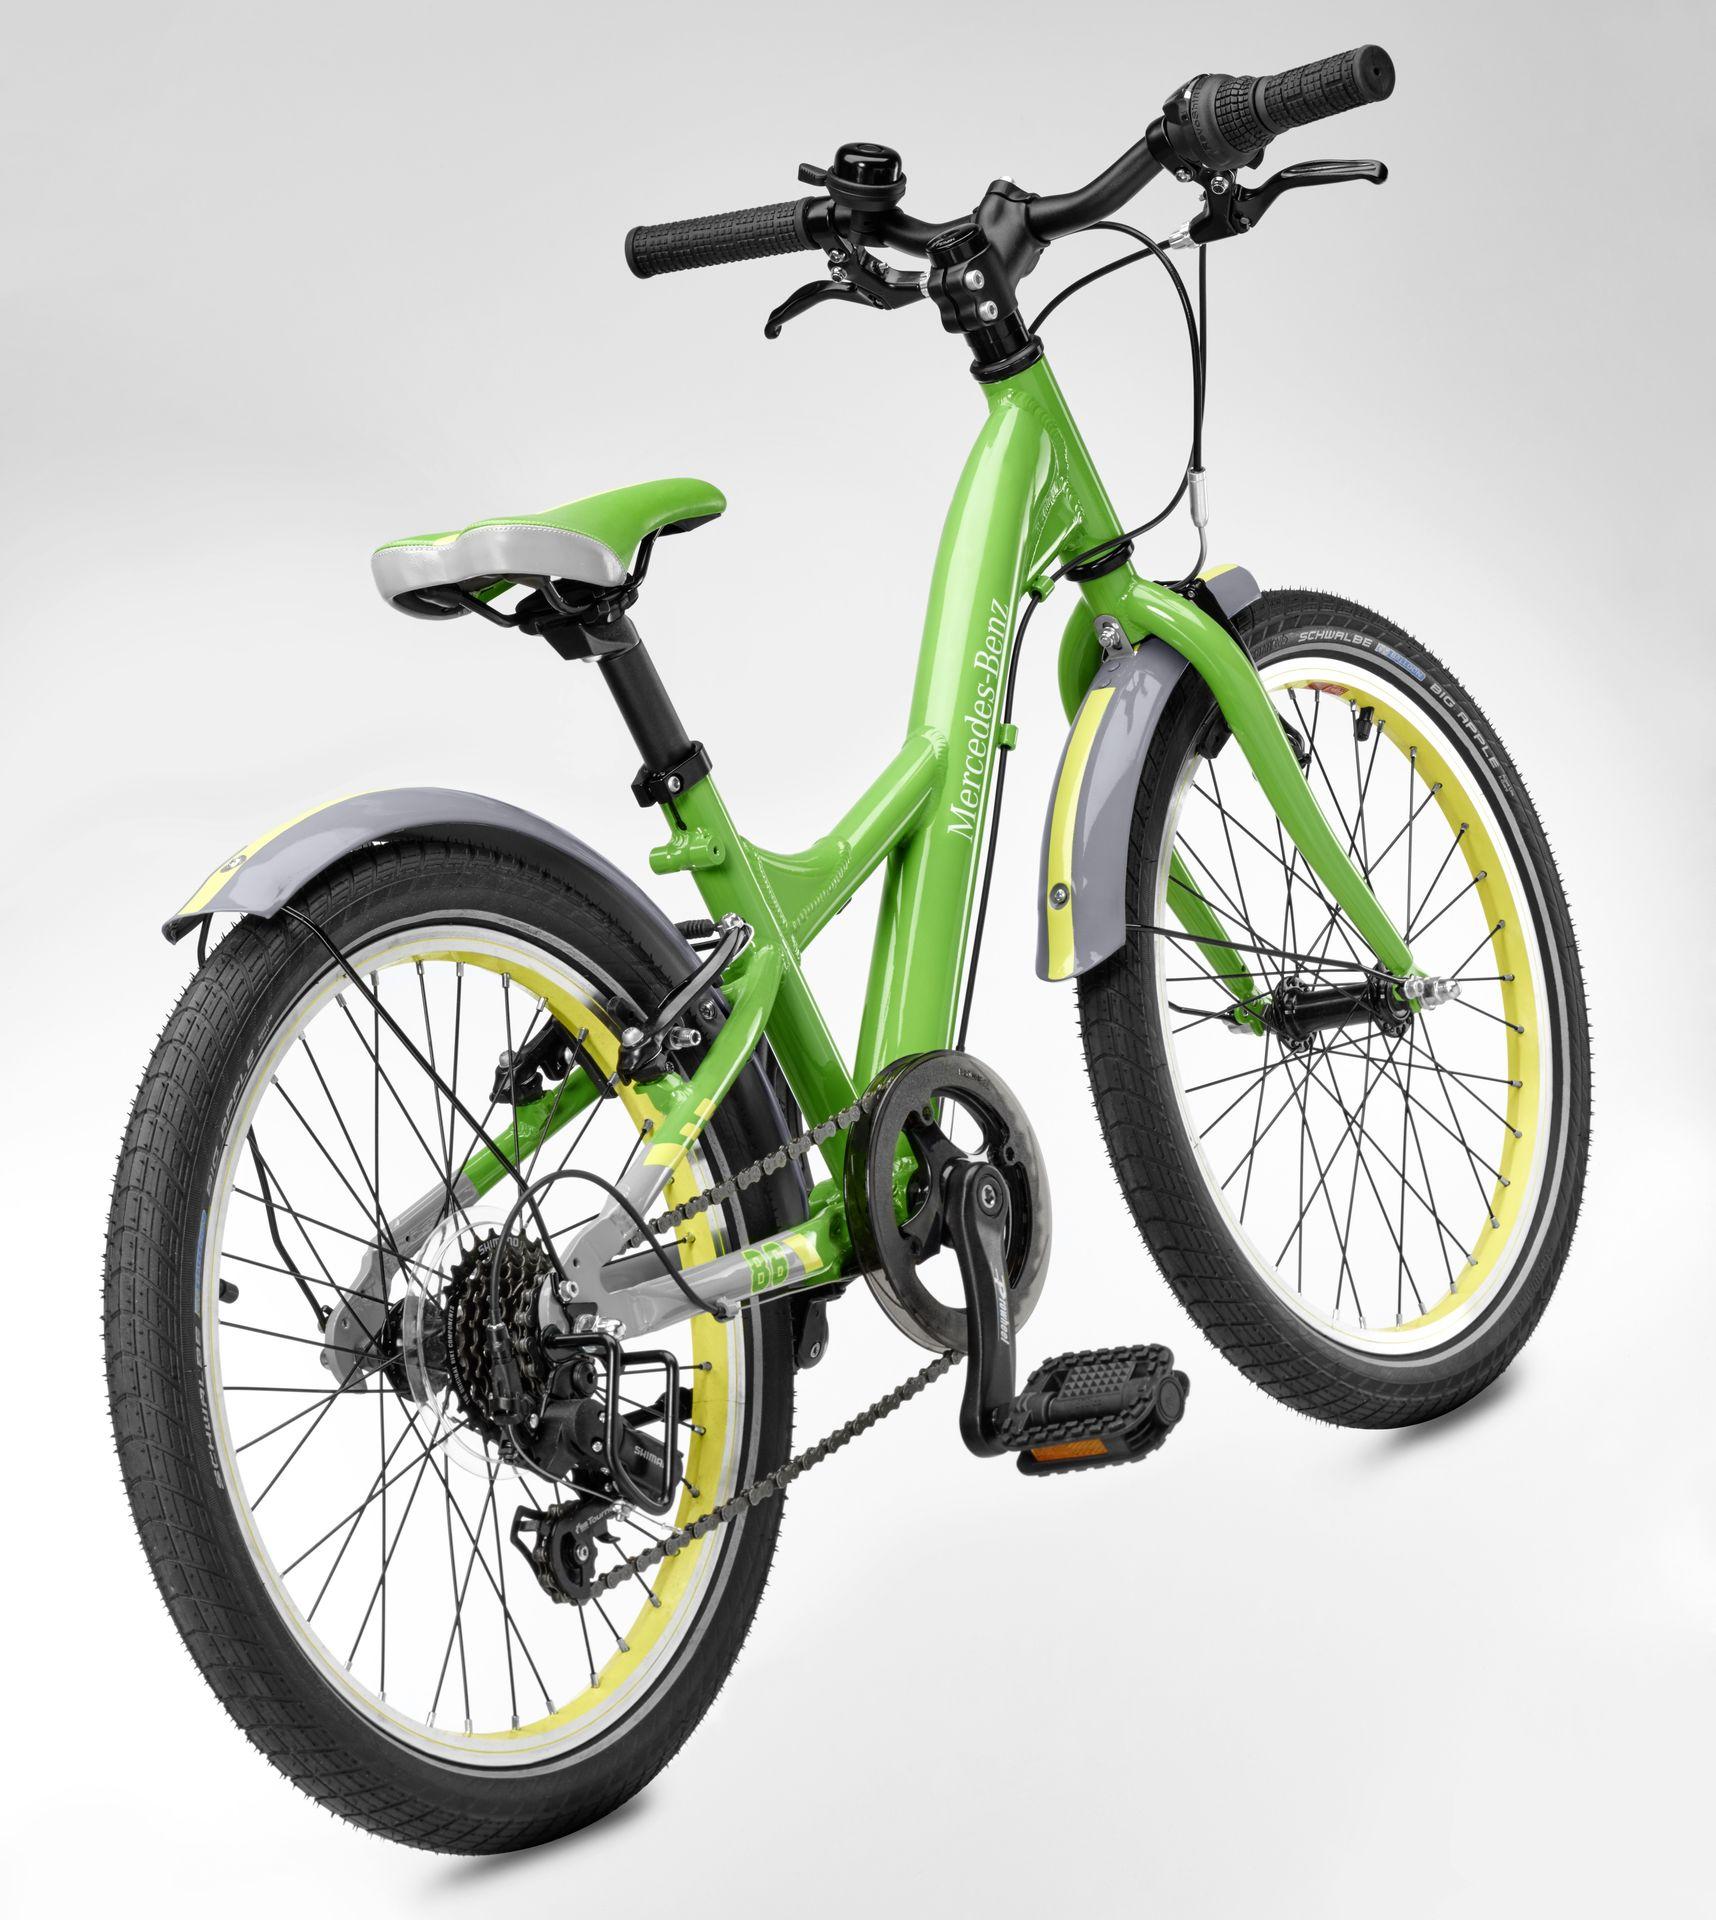 Детский велосипед Mercedes-Benz Chidren's Bike, Green, EU